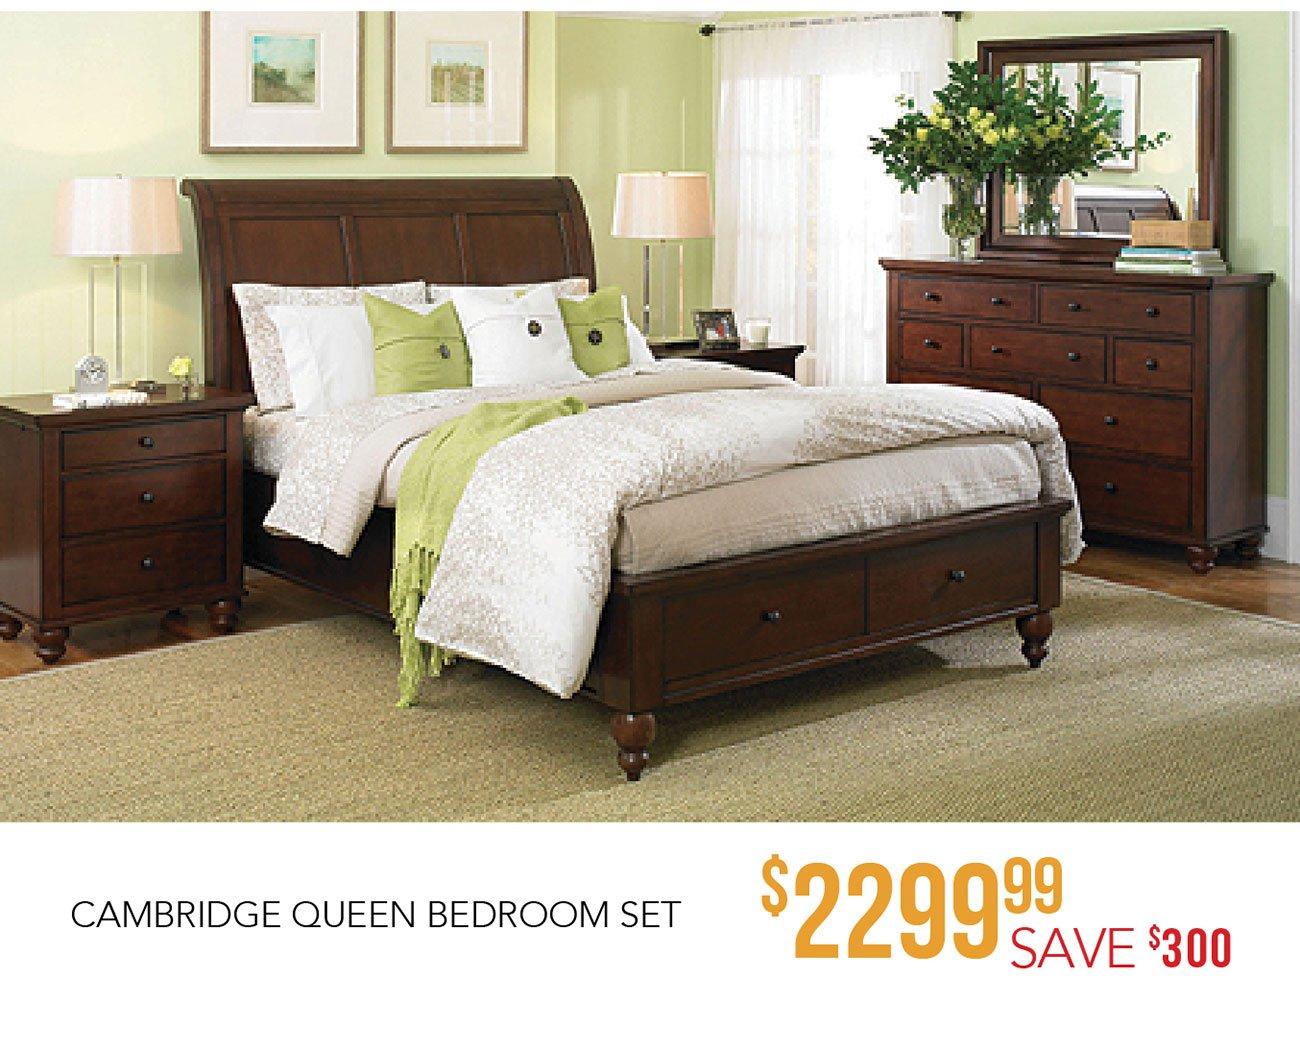 Brown Cherry Traditional 4 Piece Queen Bedroom Set   Cambridge | RC Willey  Furniture Store